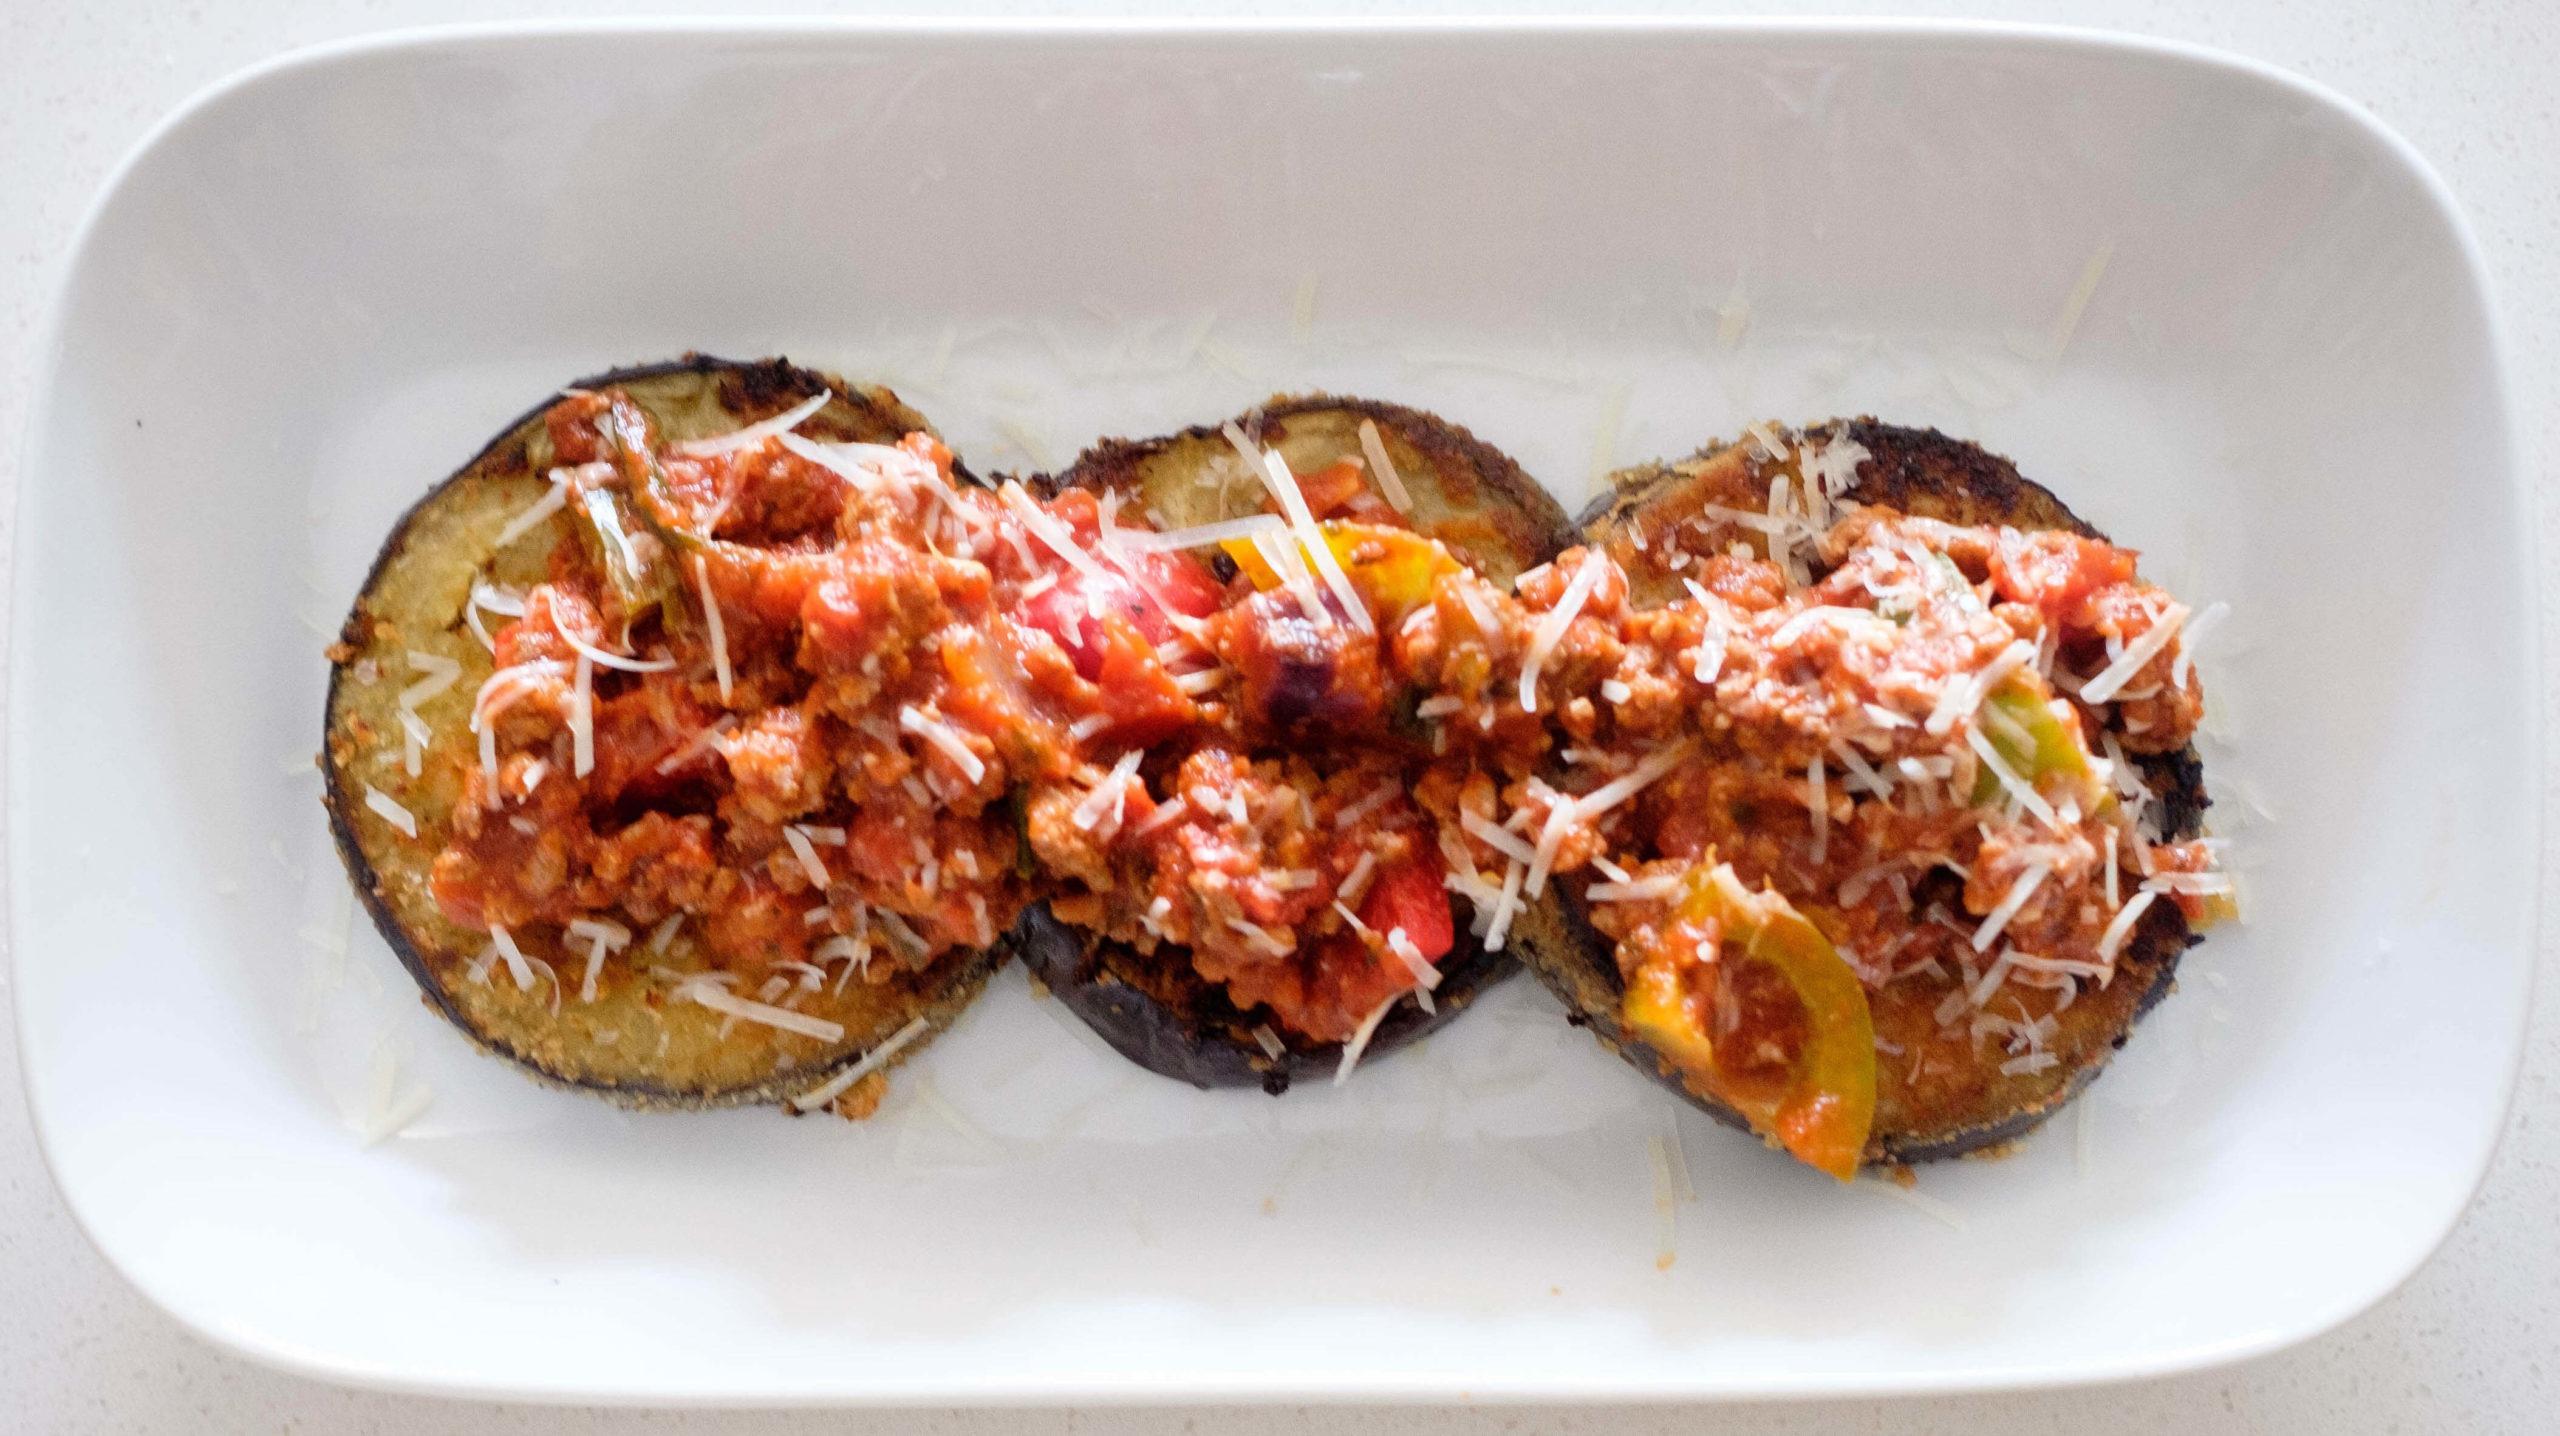 eggplant and marinara sauce